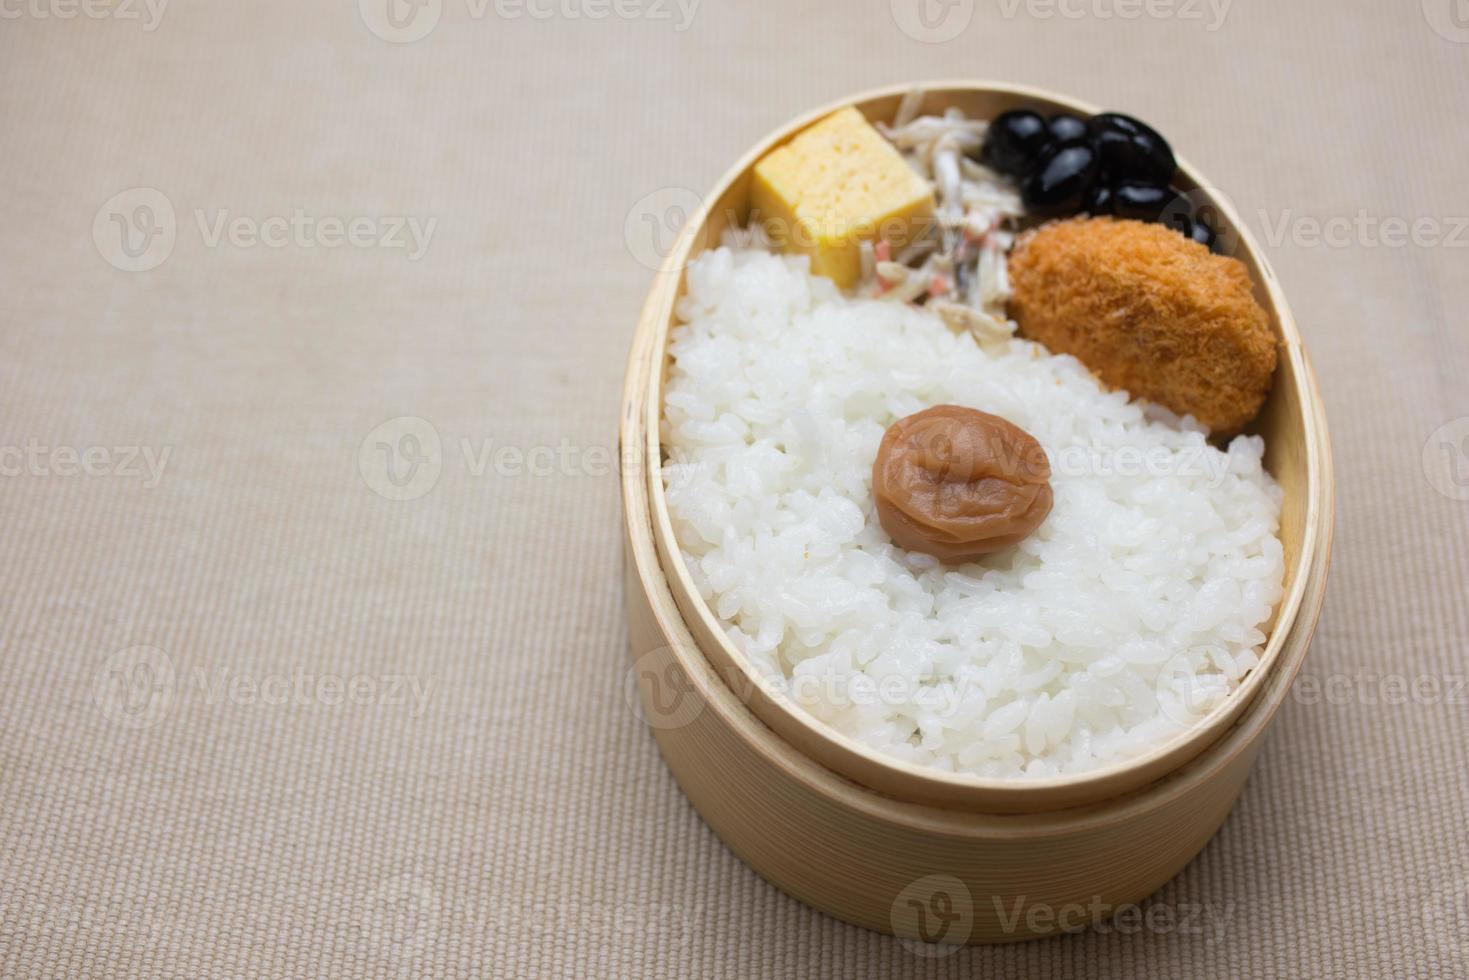 lonchera japonesa hinomaru bento (日 の 丸 弁 当) foto